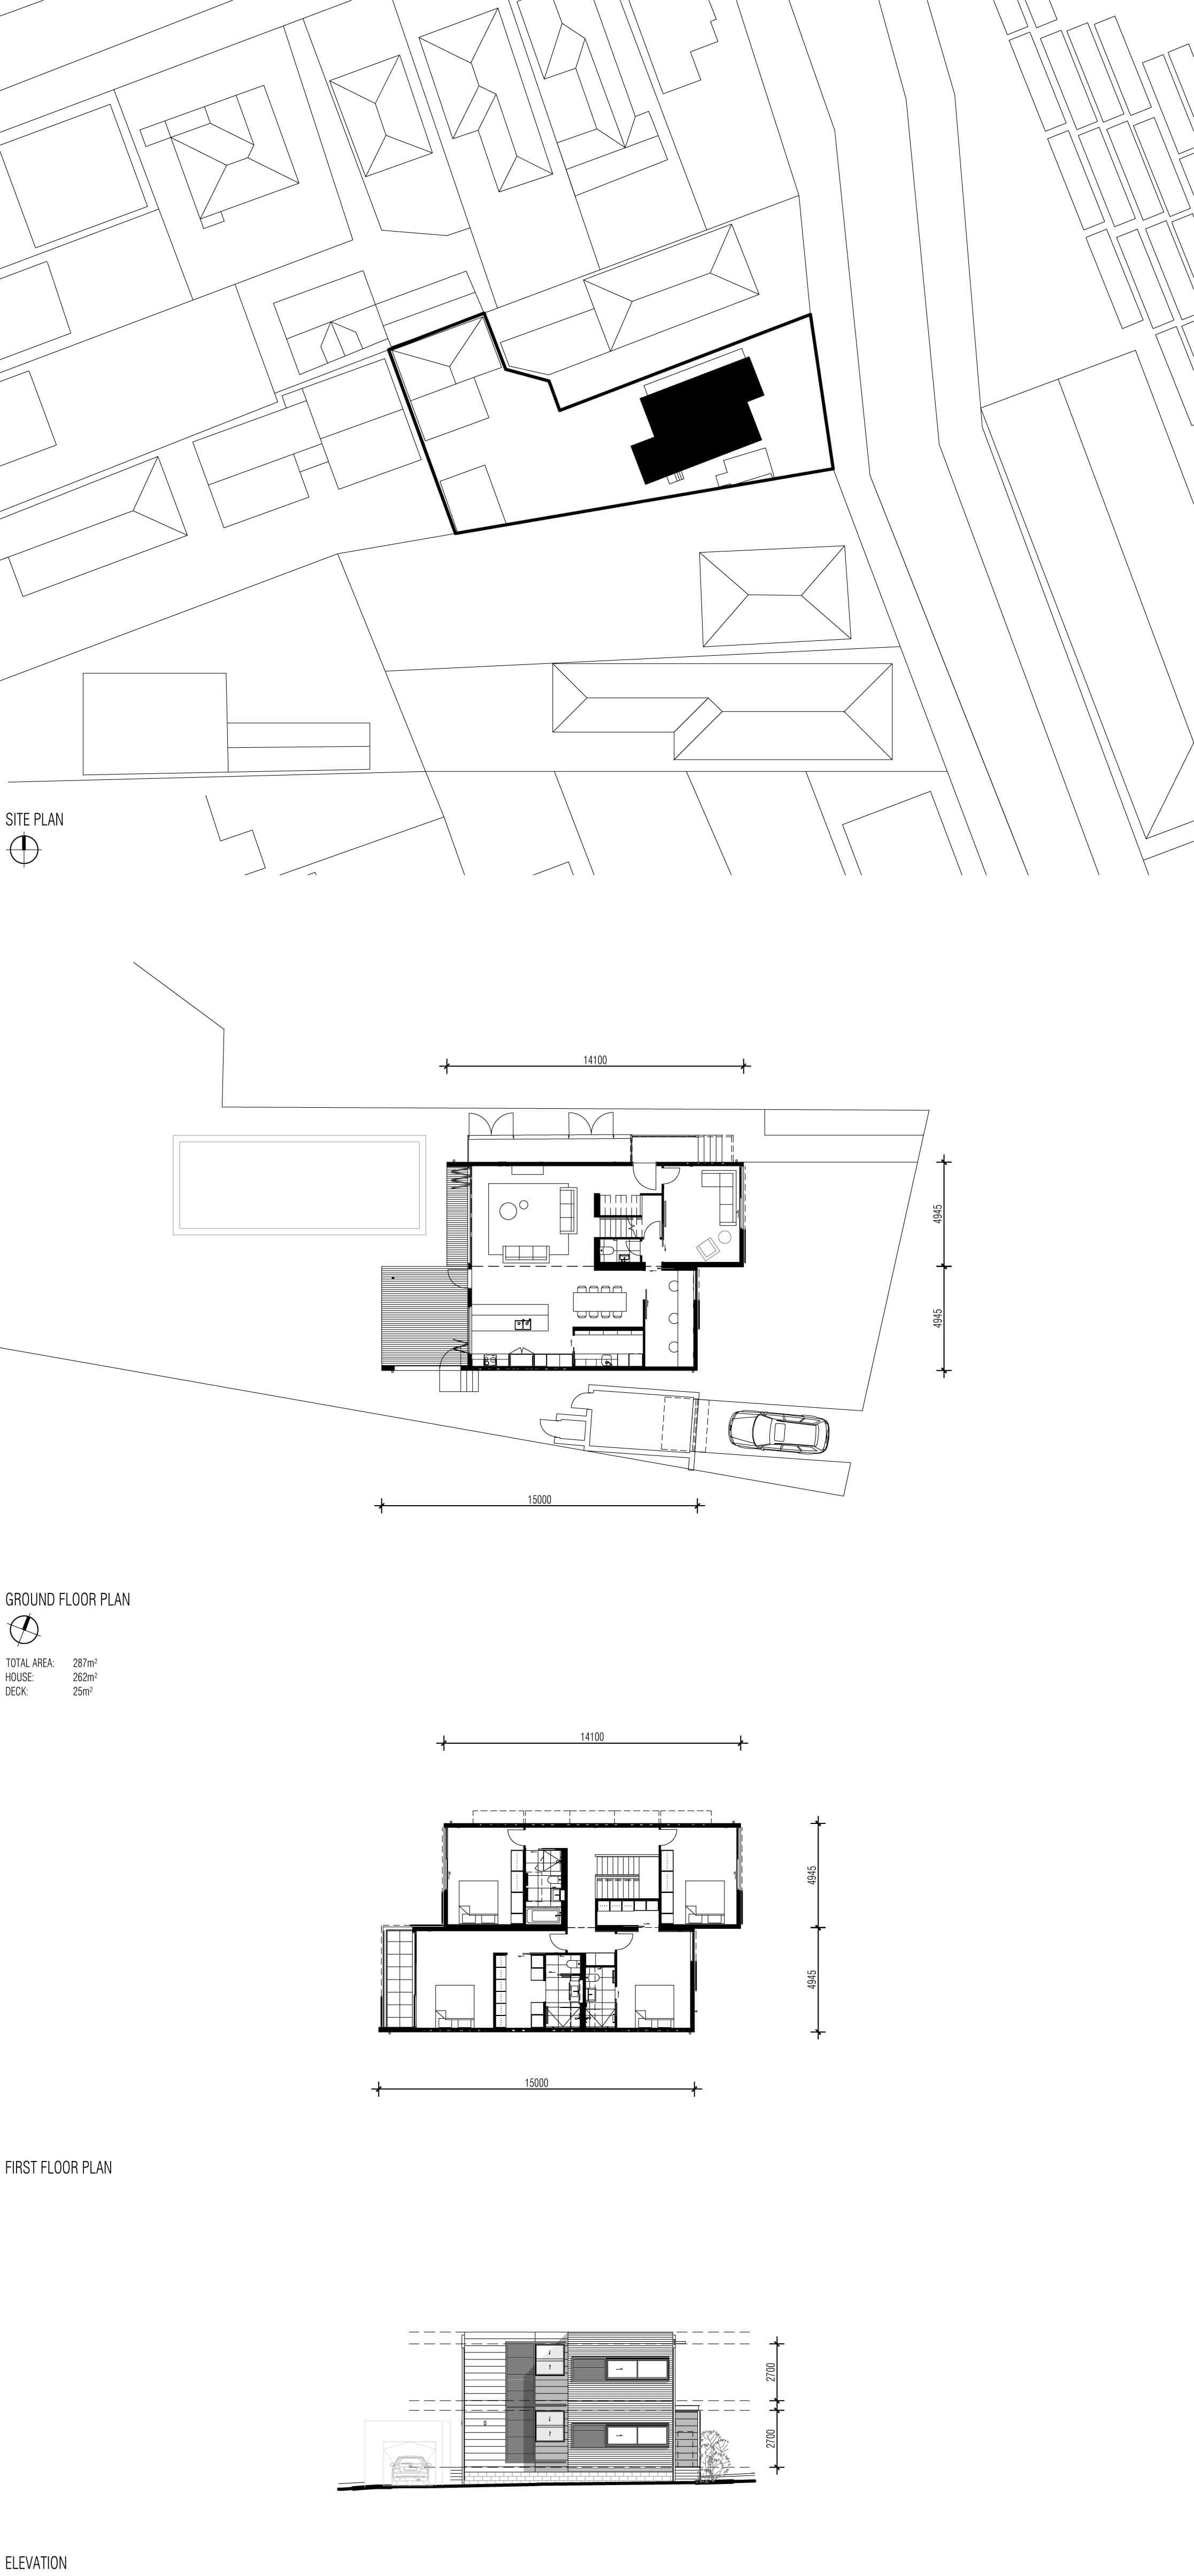 Modular Homes in NSW - Lane Cove floor plan